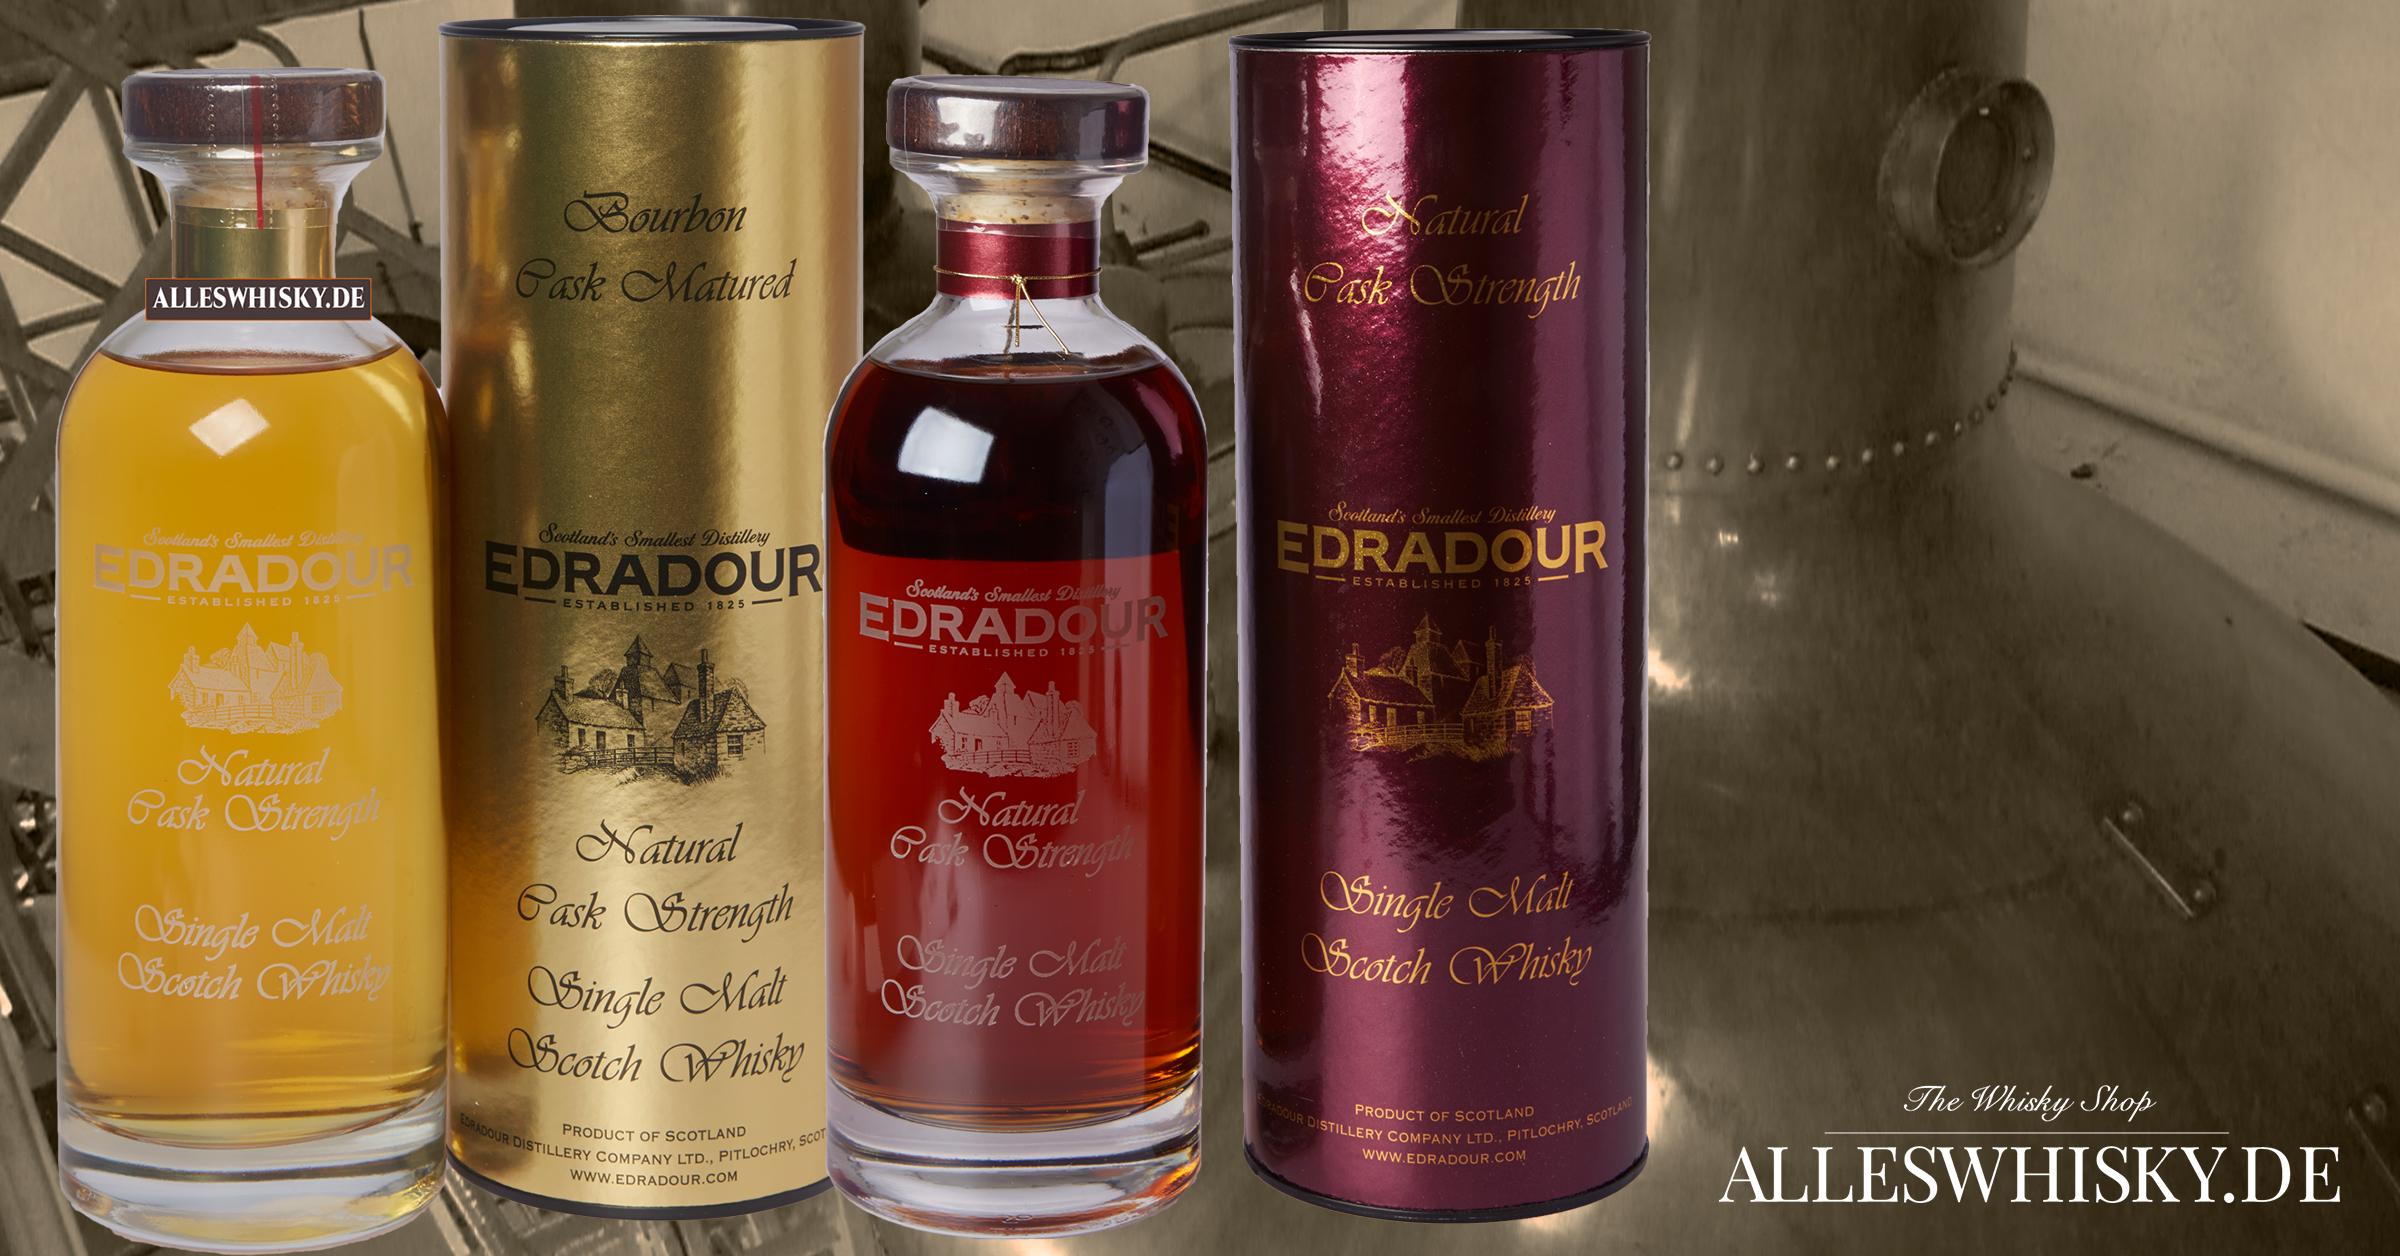 Edradour Ibisco Decanter Bourbon Sherry Whisky Brennerei Pot Stills Oktober 2011